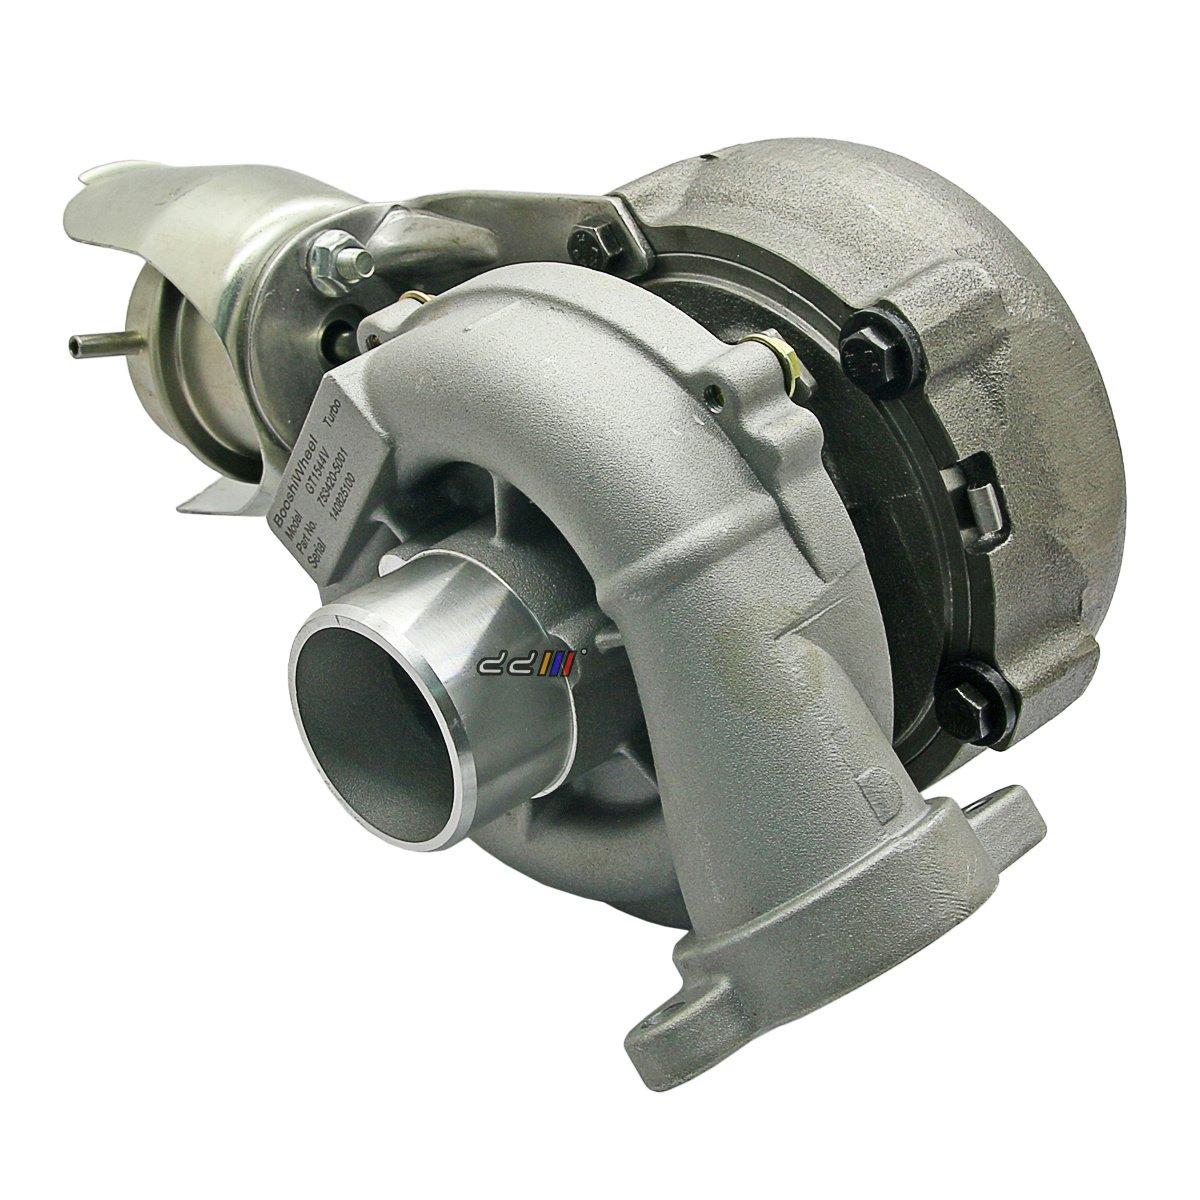 Amazon.com: Turbo Turbocharger For Citroen C2 C3 C4 Picasso C5 DV6TED4 GT1554V 753420-5004: Automotive